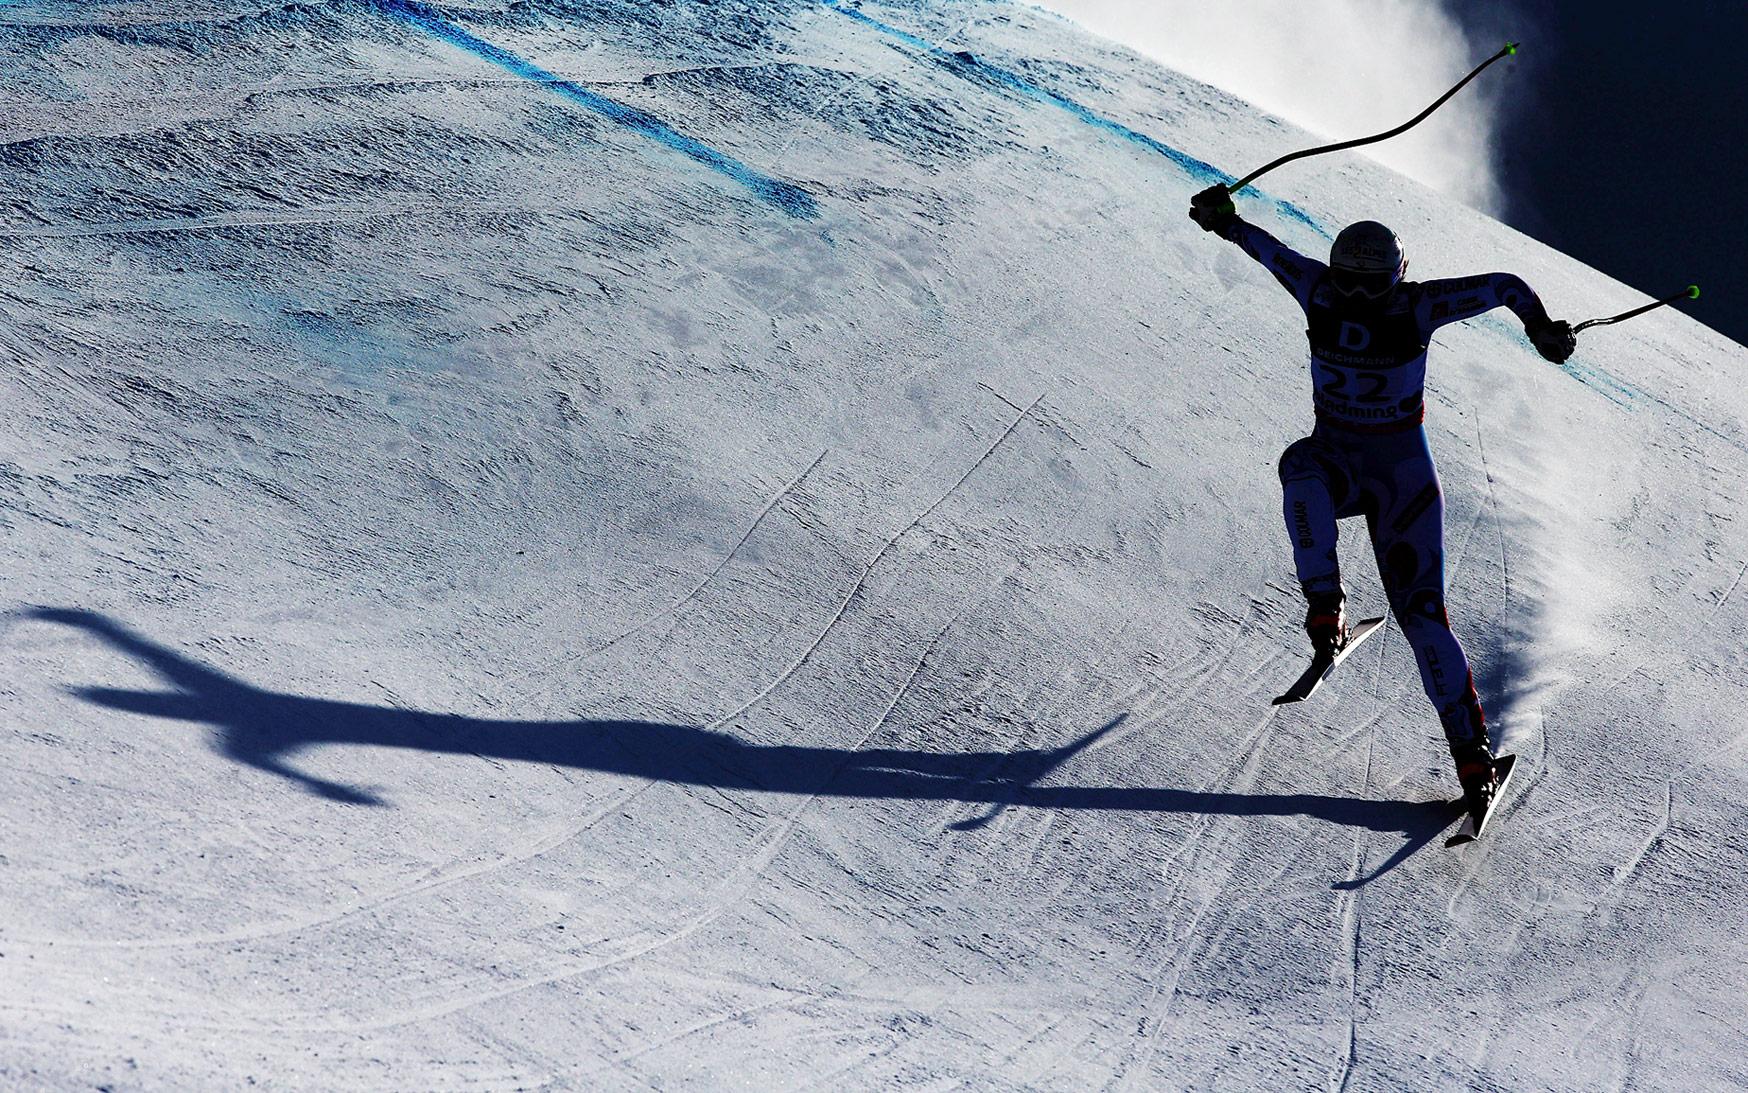 Skiing shadows